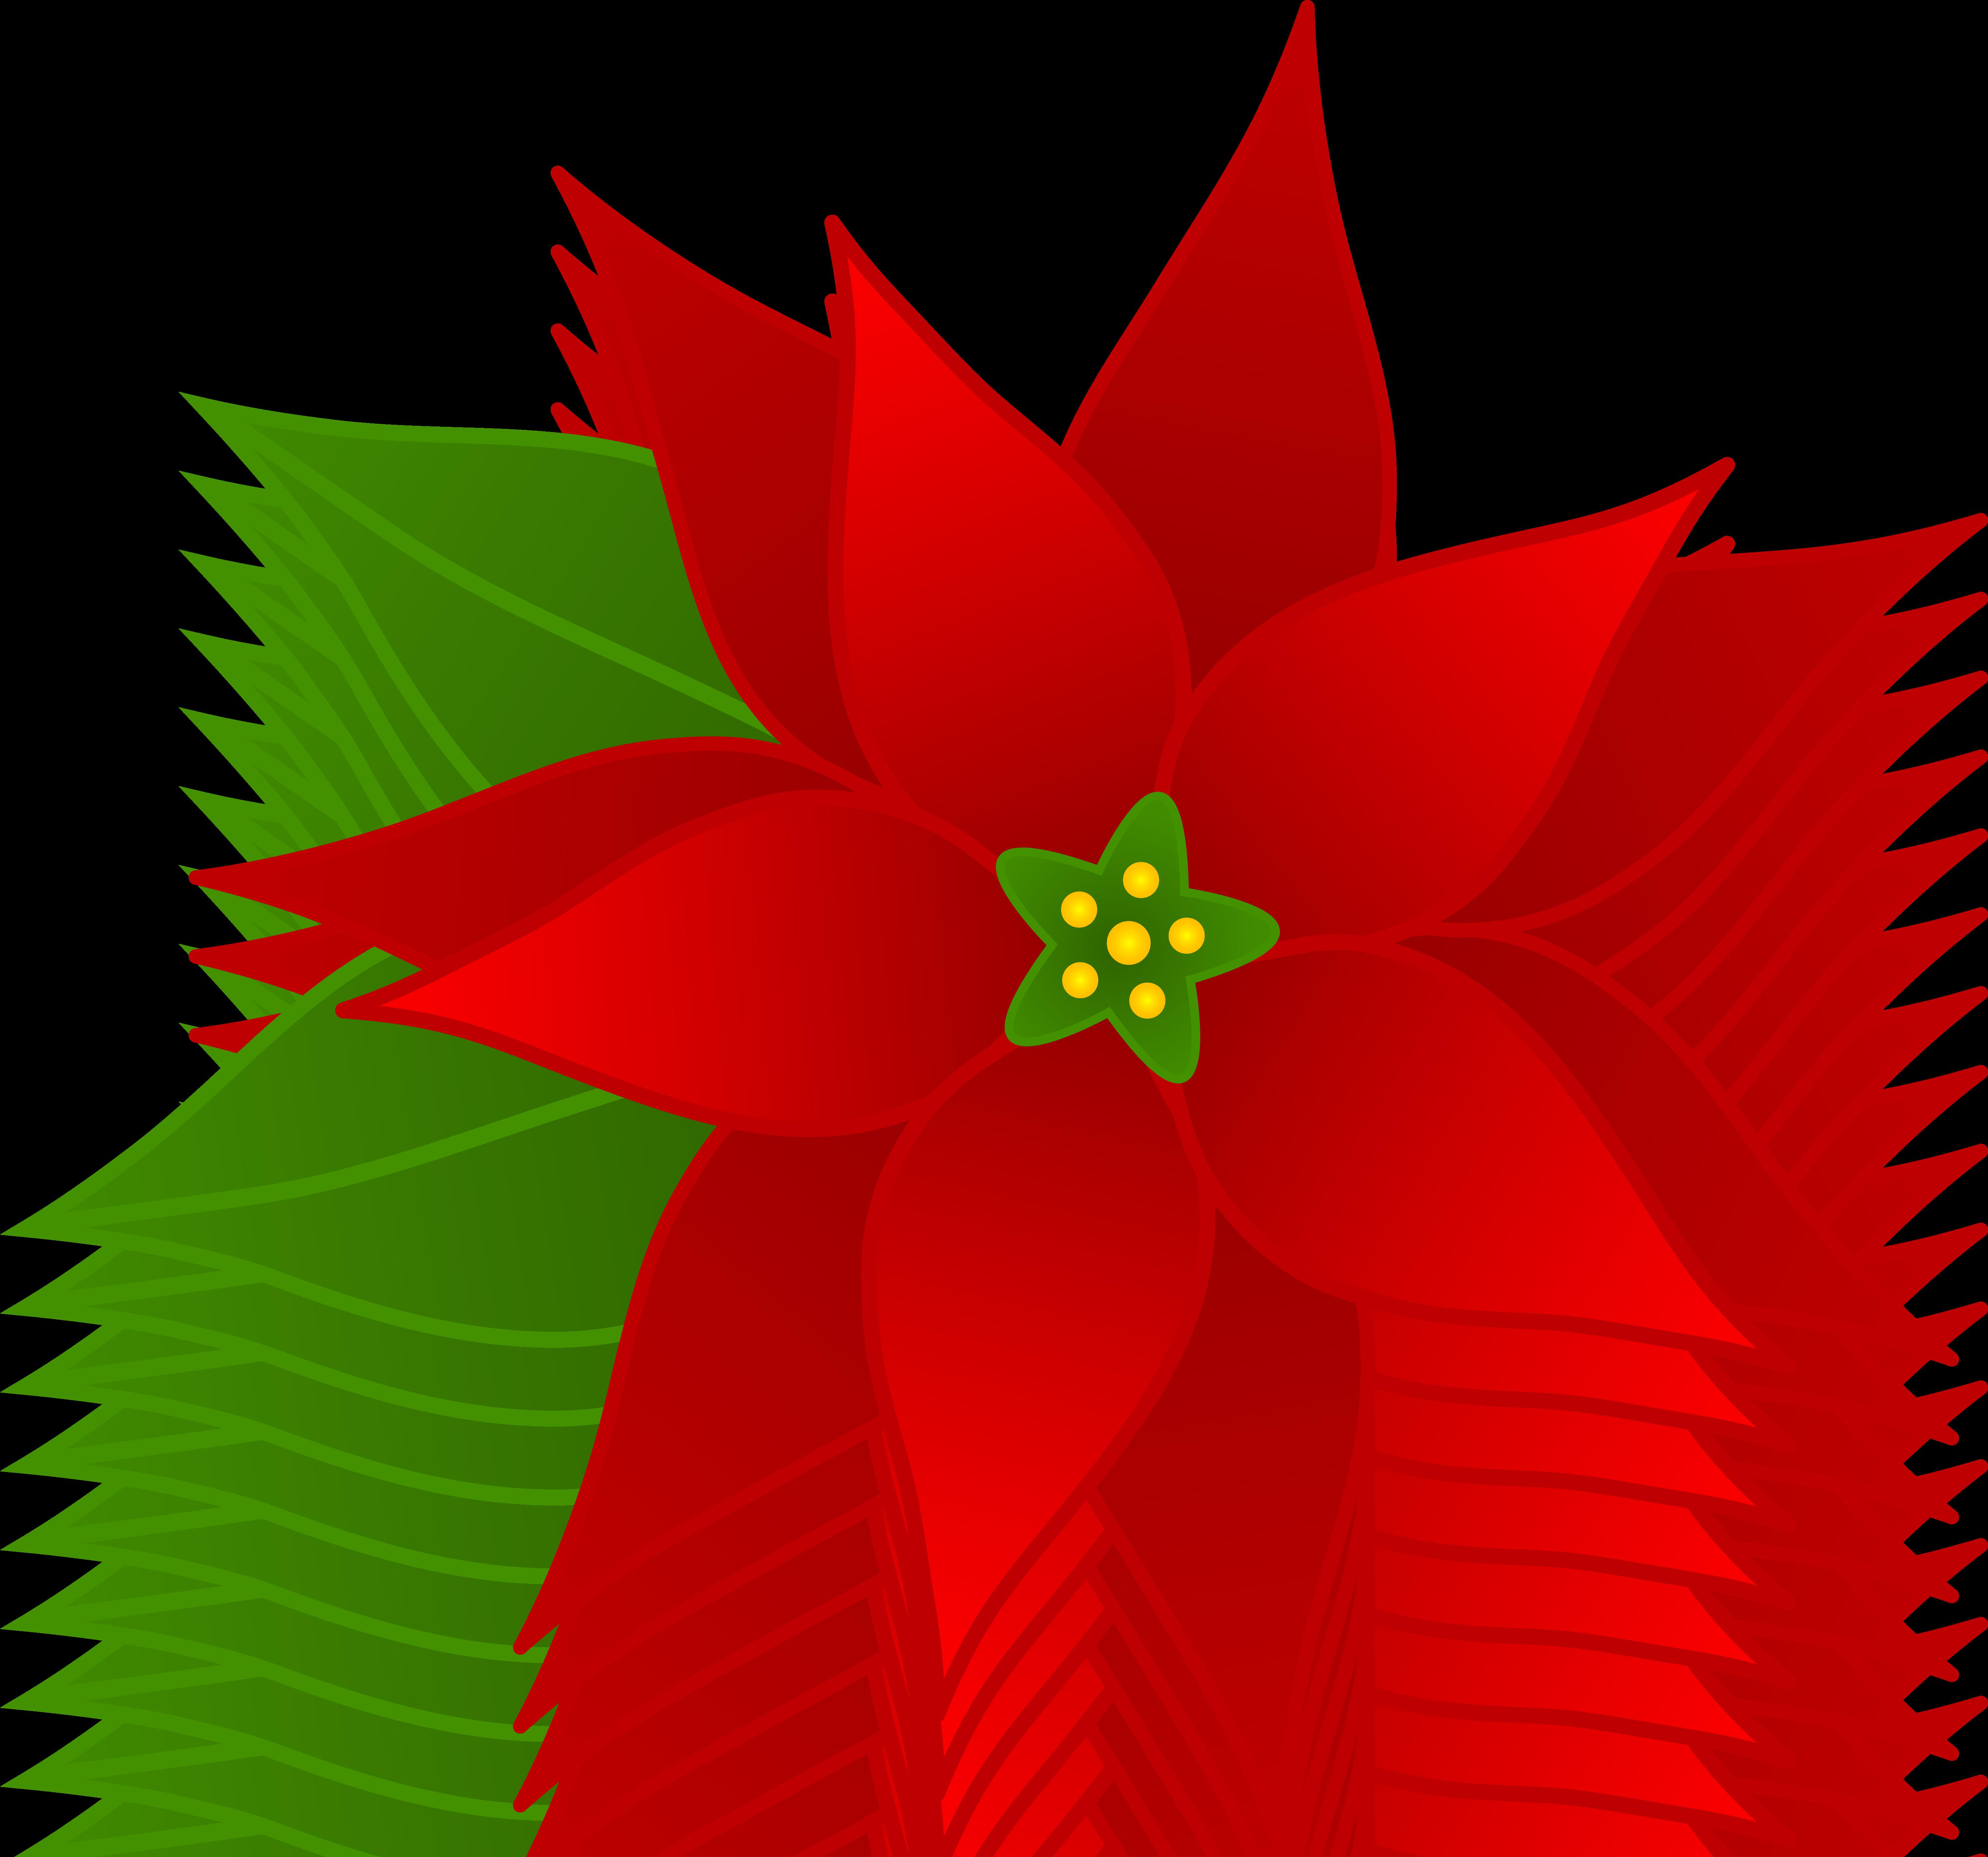 5747x5369 Christmas Poinsettia Flower